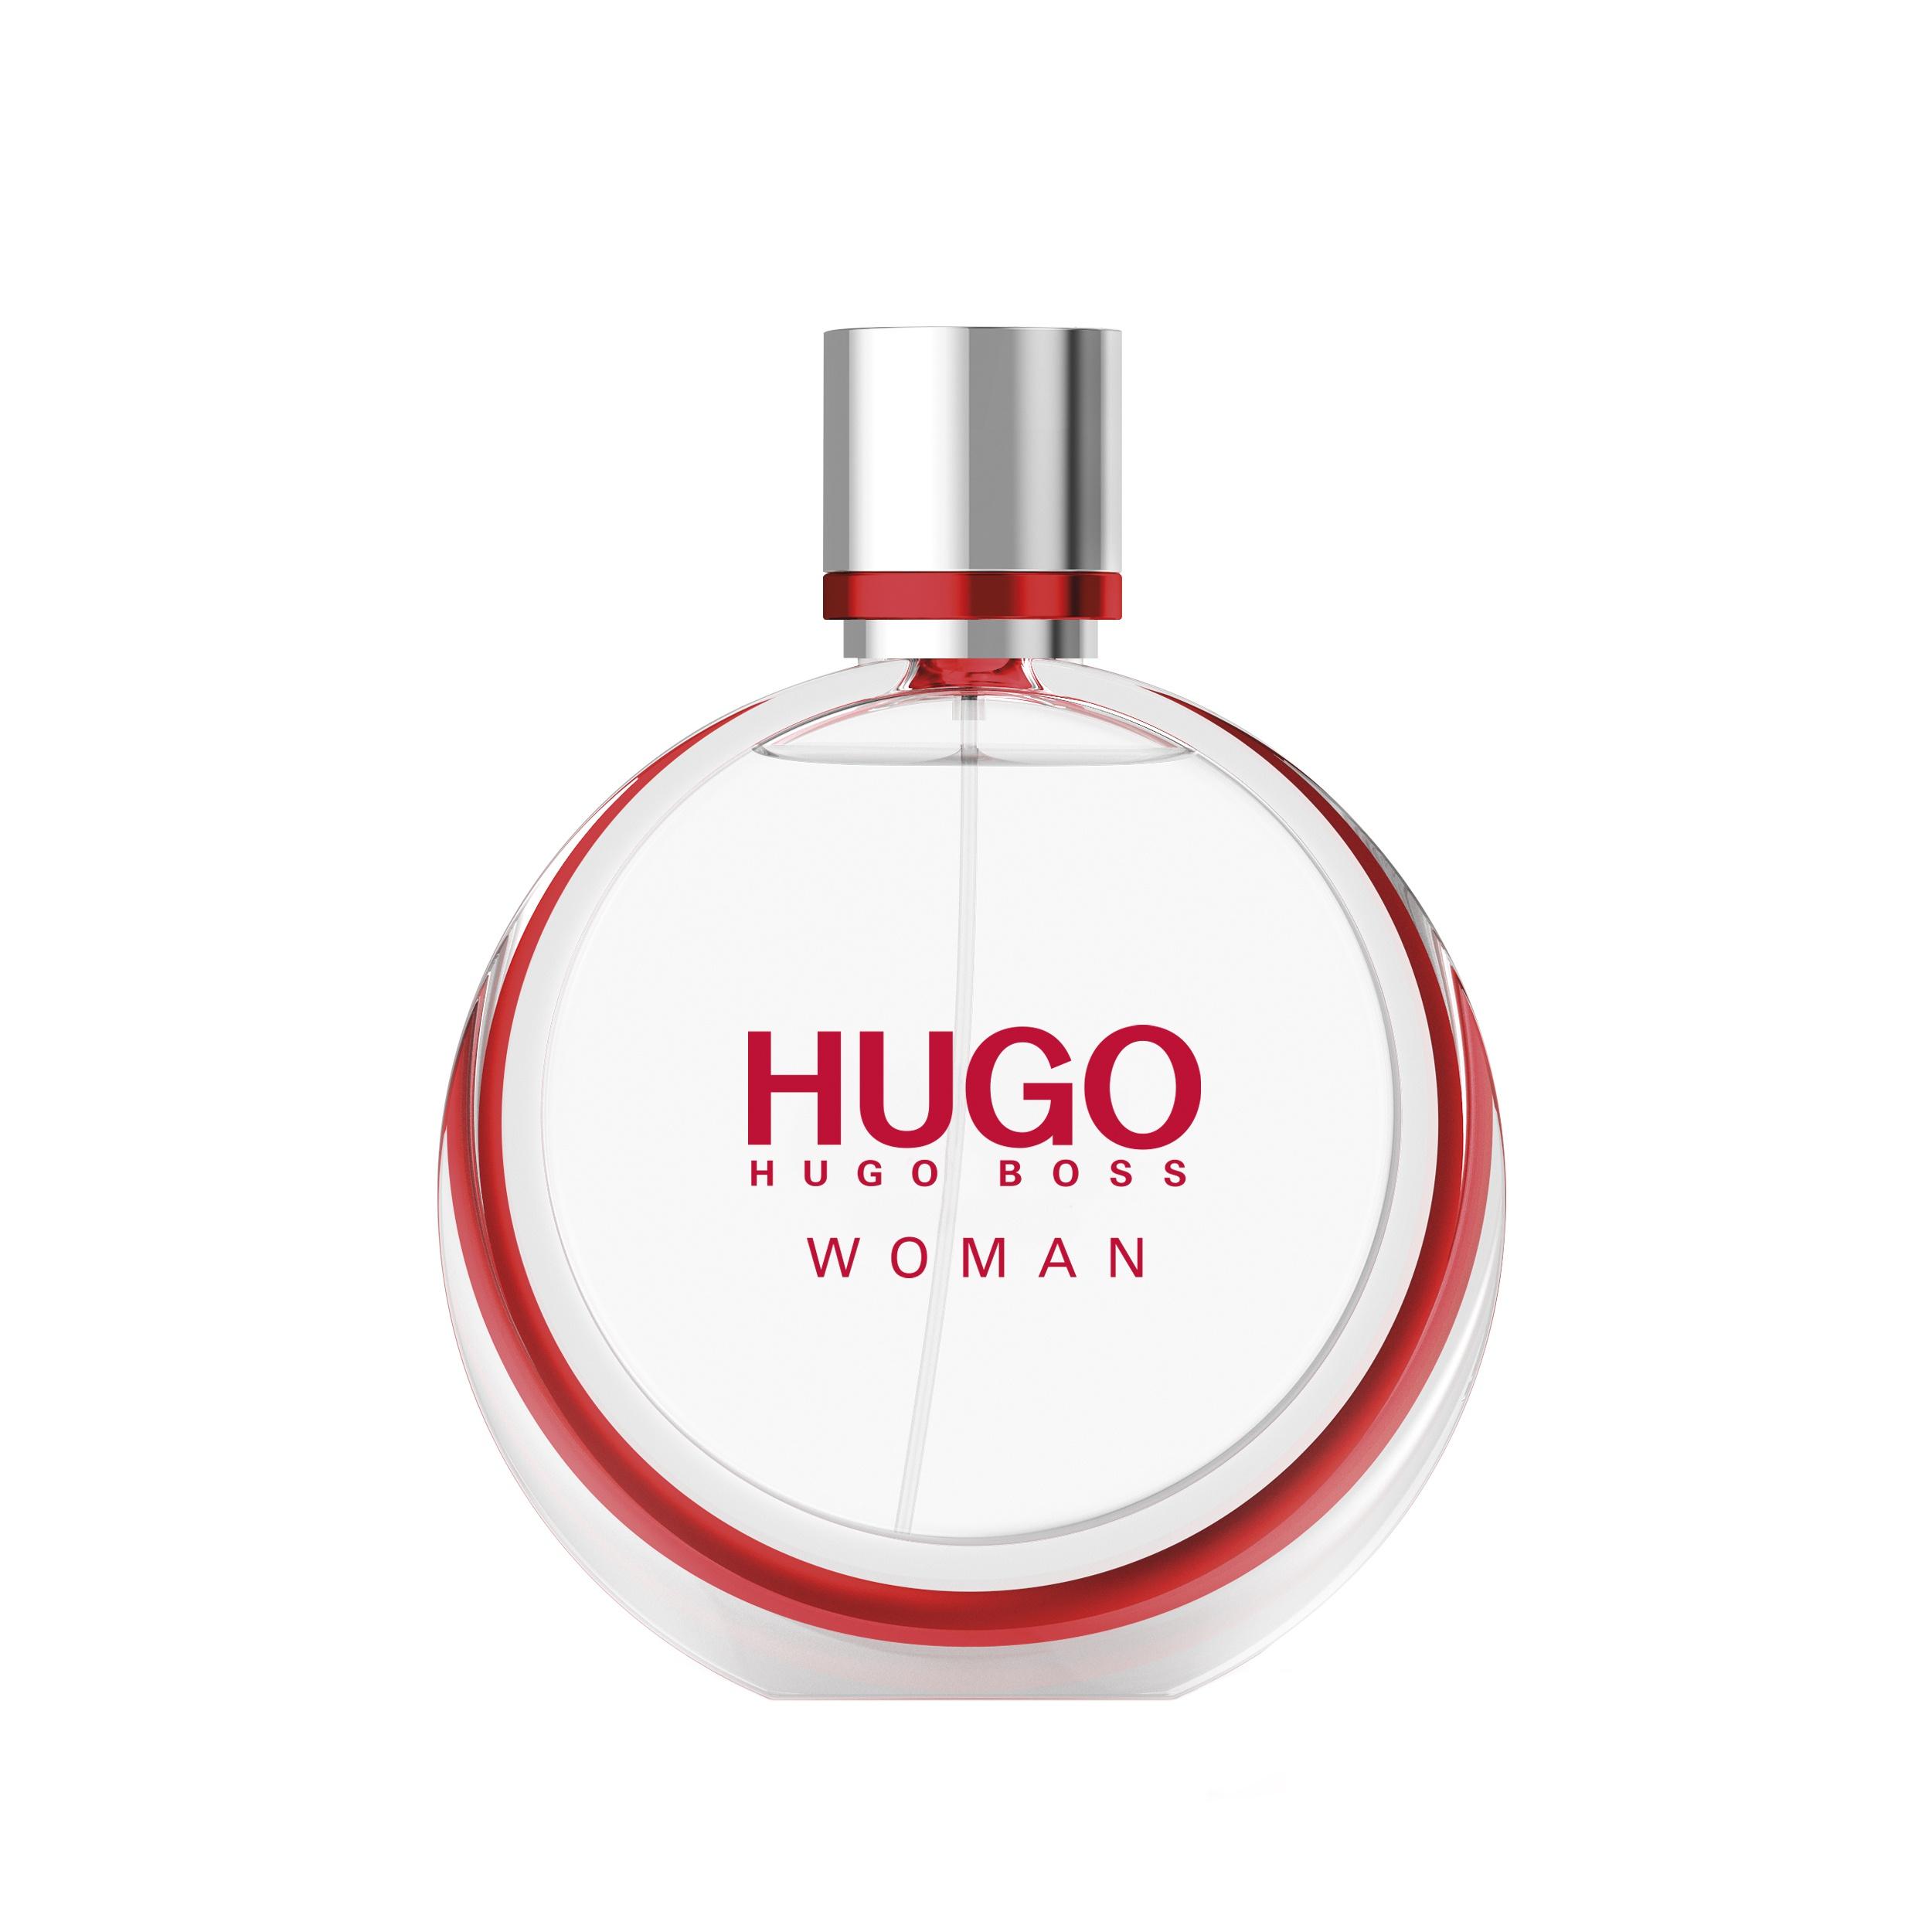 Hugo Boss HUGO Woman EDP, 50 ml